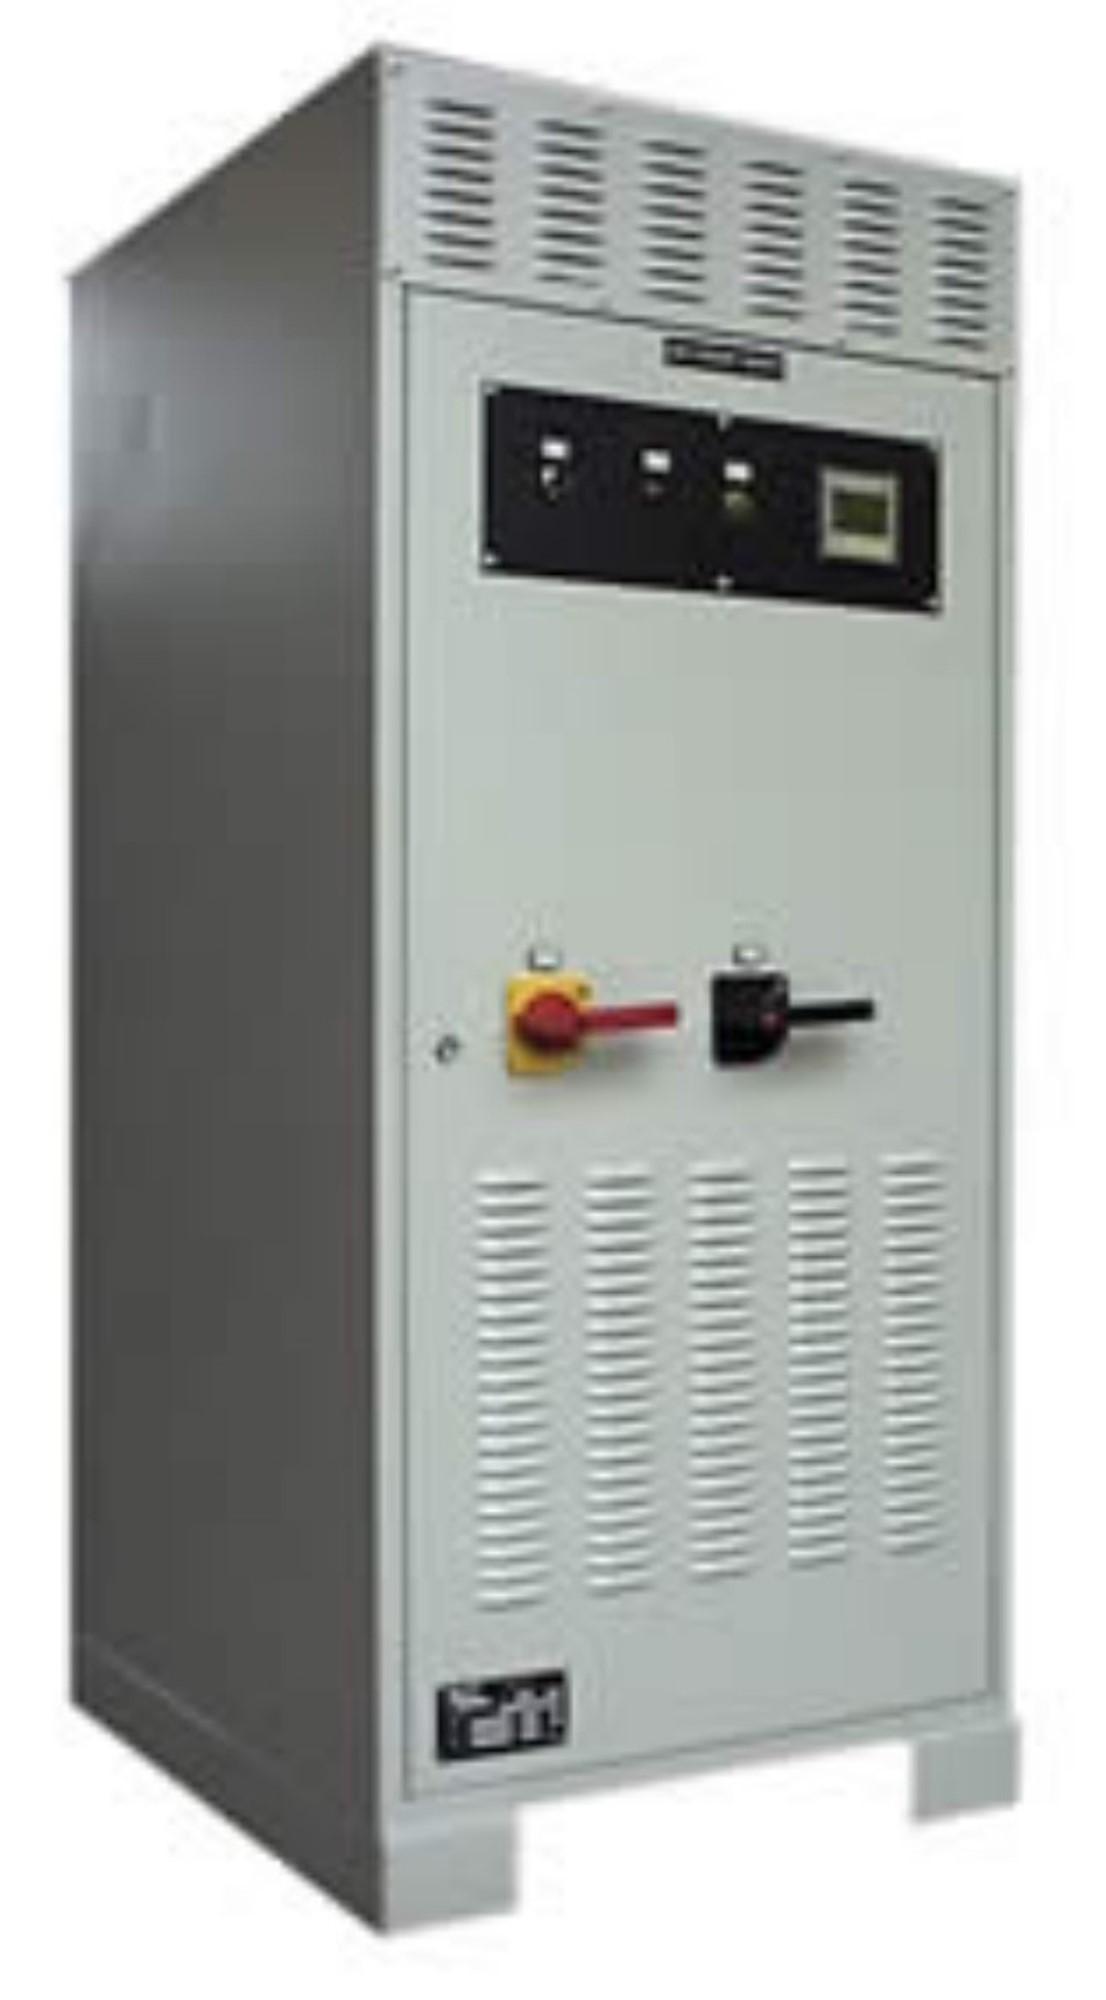 EPS/FC 2040033 20 kVA Avionik Konverter